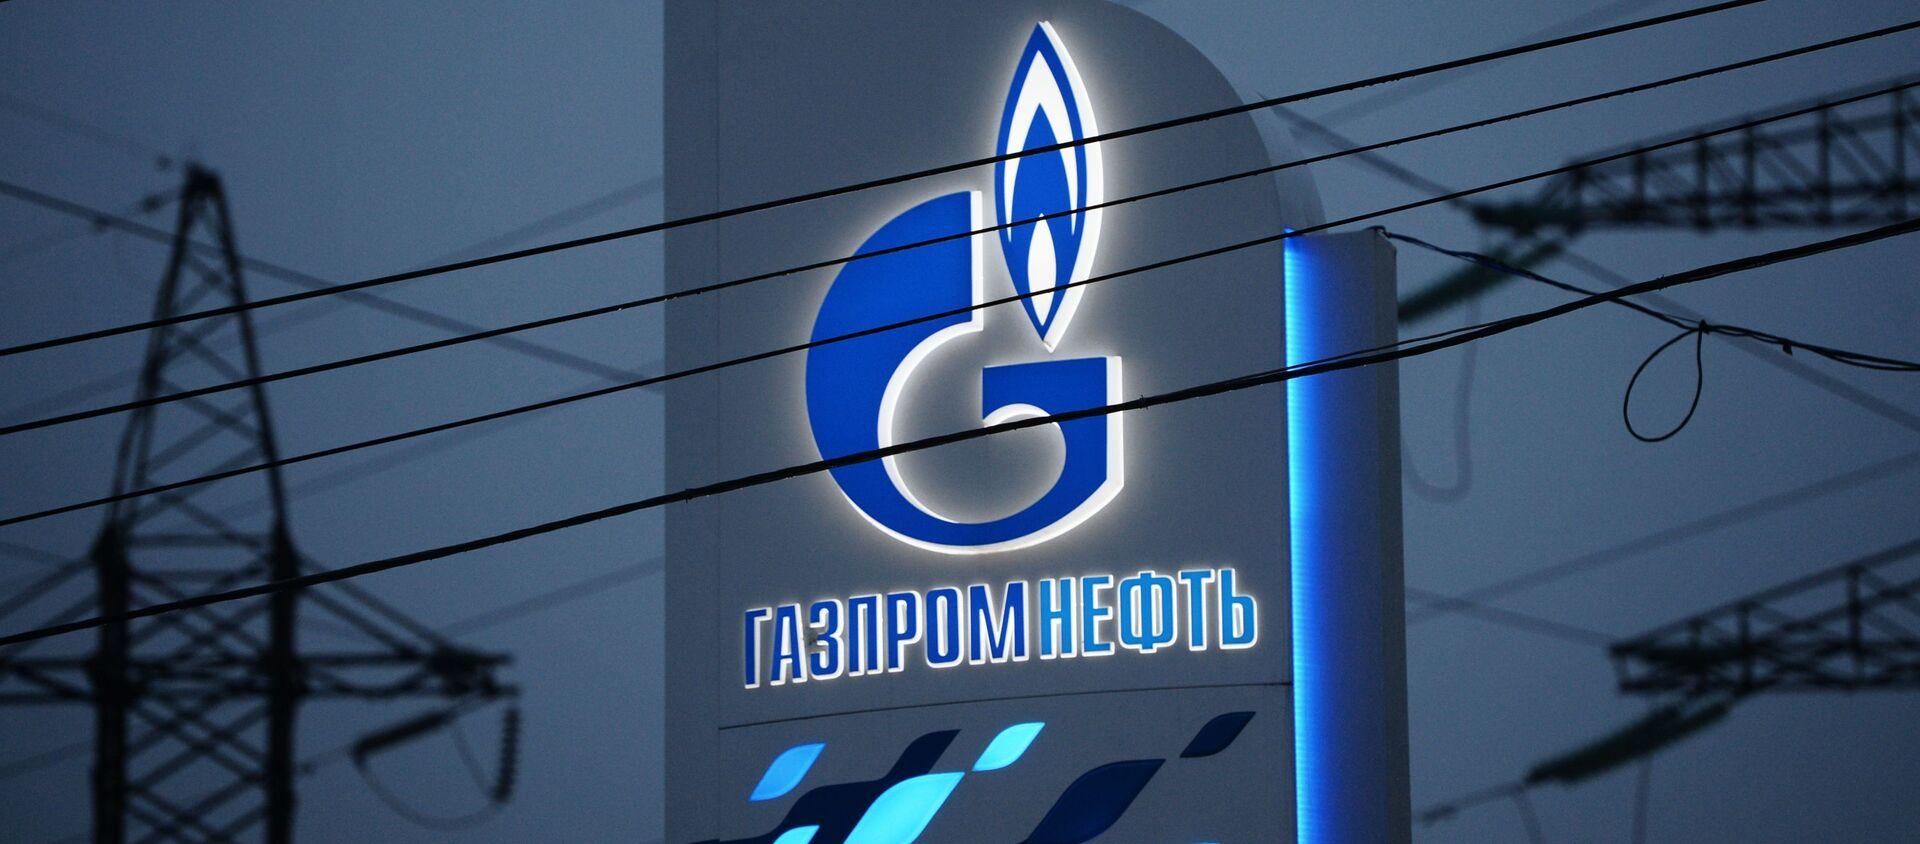 Logo de la empresa rusa Gazprom Neft - Sputnik Mundo, 1920, 16.06.2020